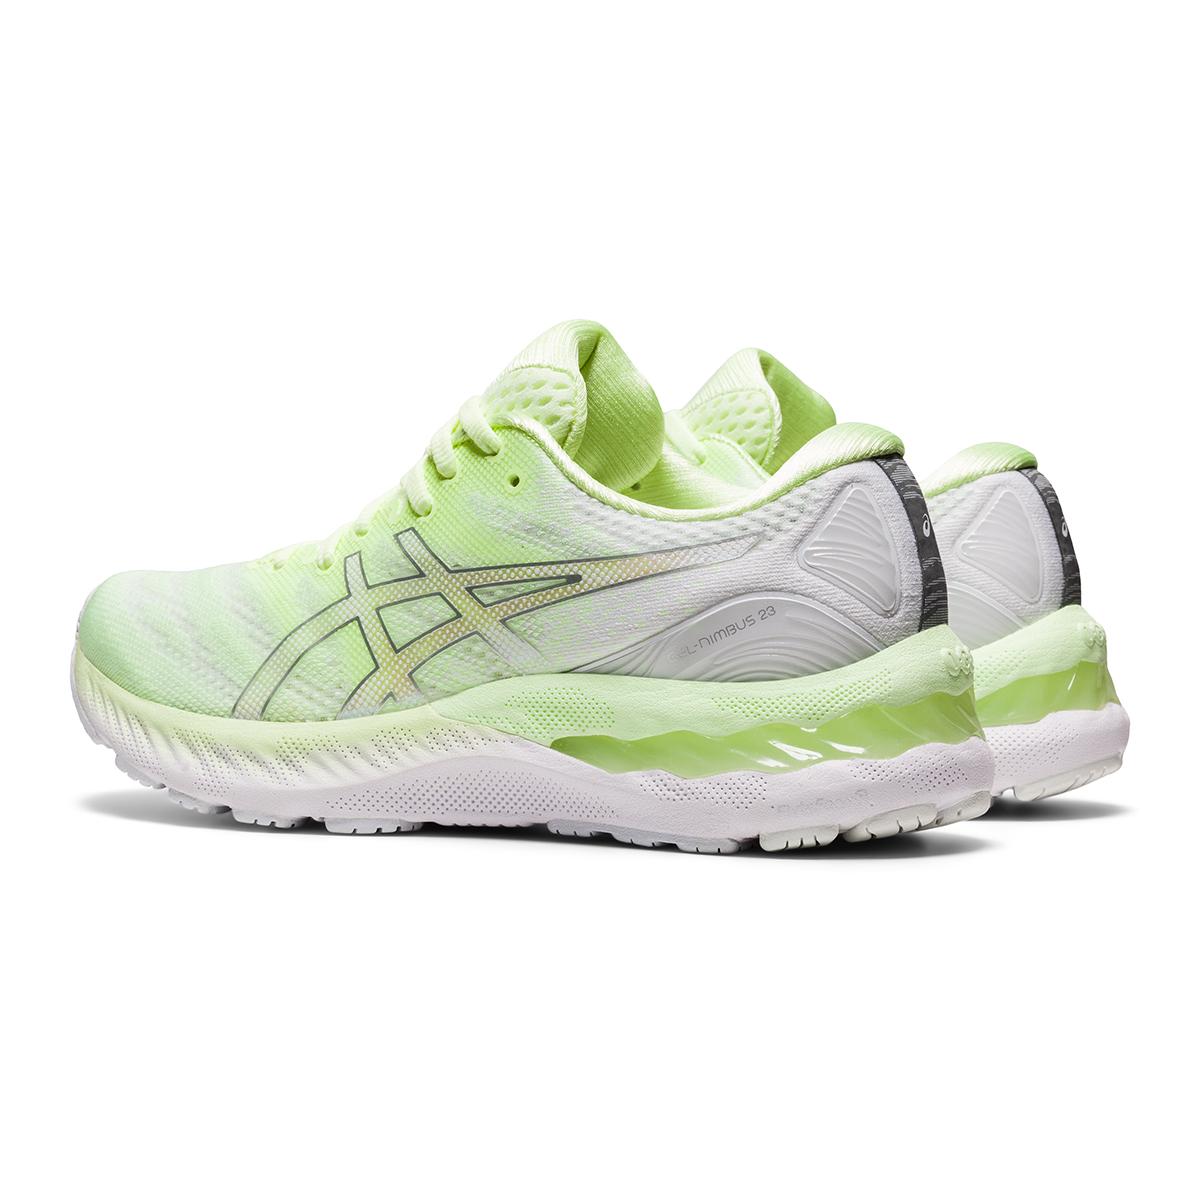 Women's Asics Gel-Nimbus 23 Running Shoe - Color: Illuminate Yellow - Size: 5 - Width: Regular, Illuminate Yellow, large, image 4